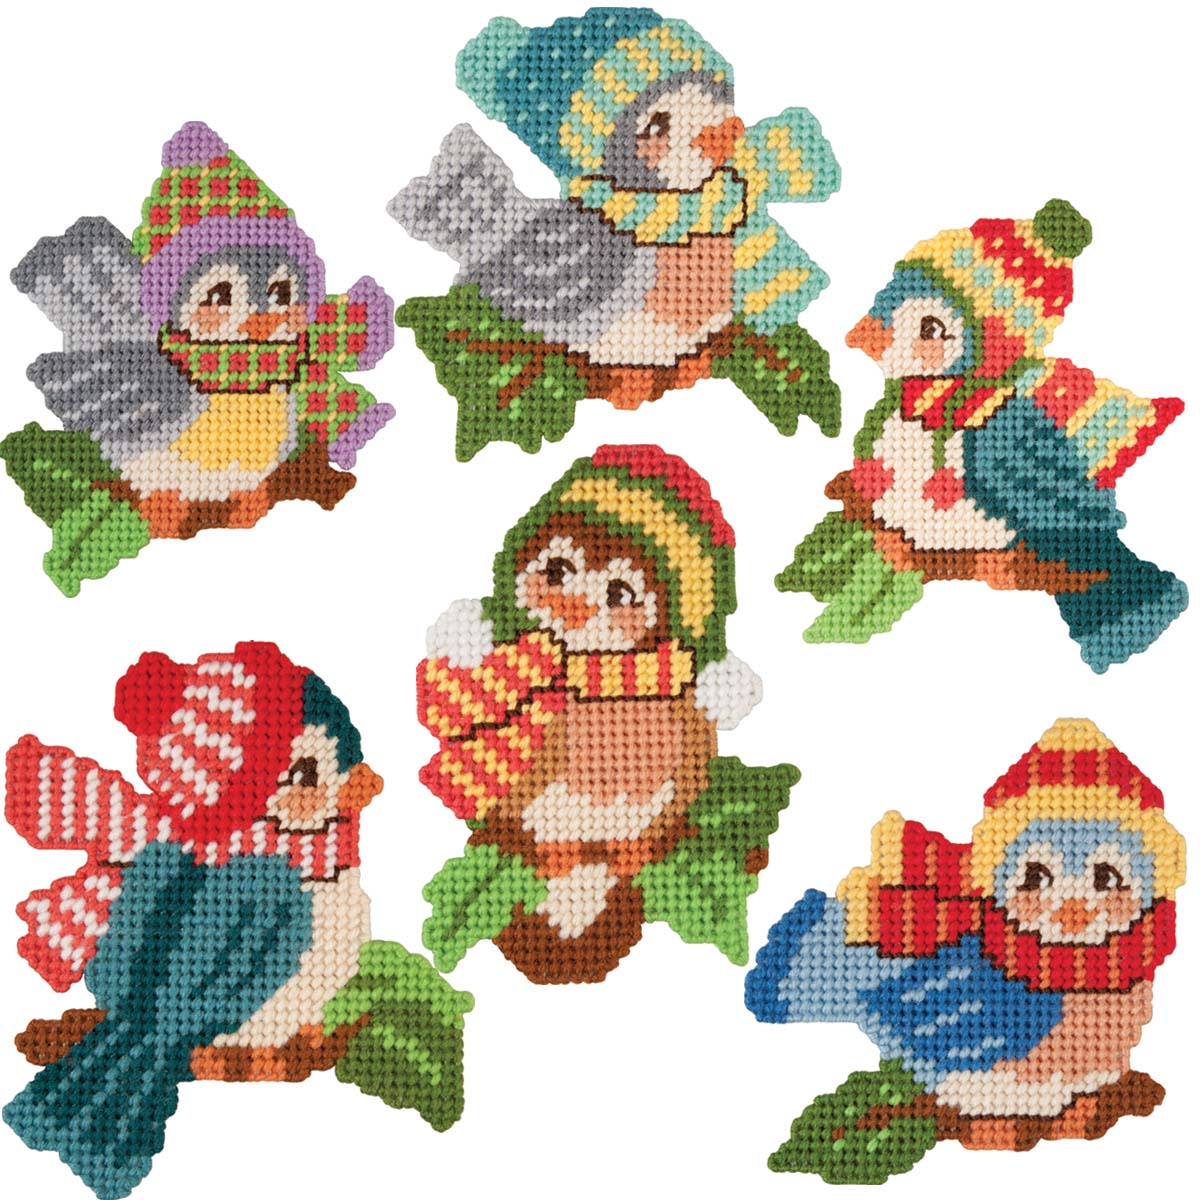 Herrschners® Winter Birds Ornaments Plastic Canvas Kit